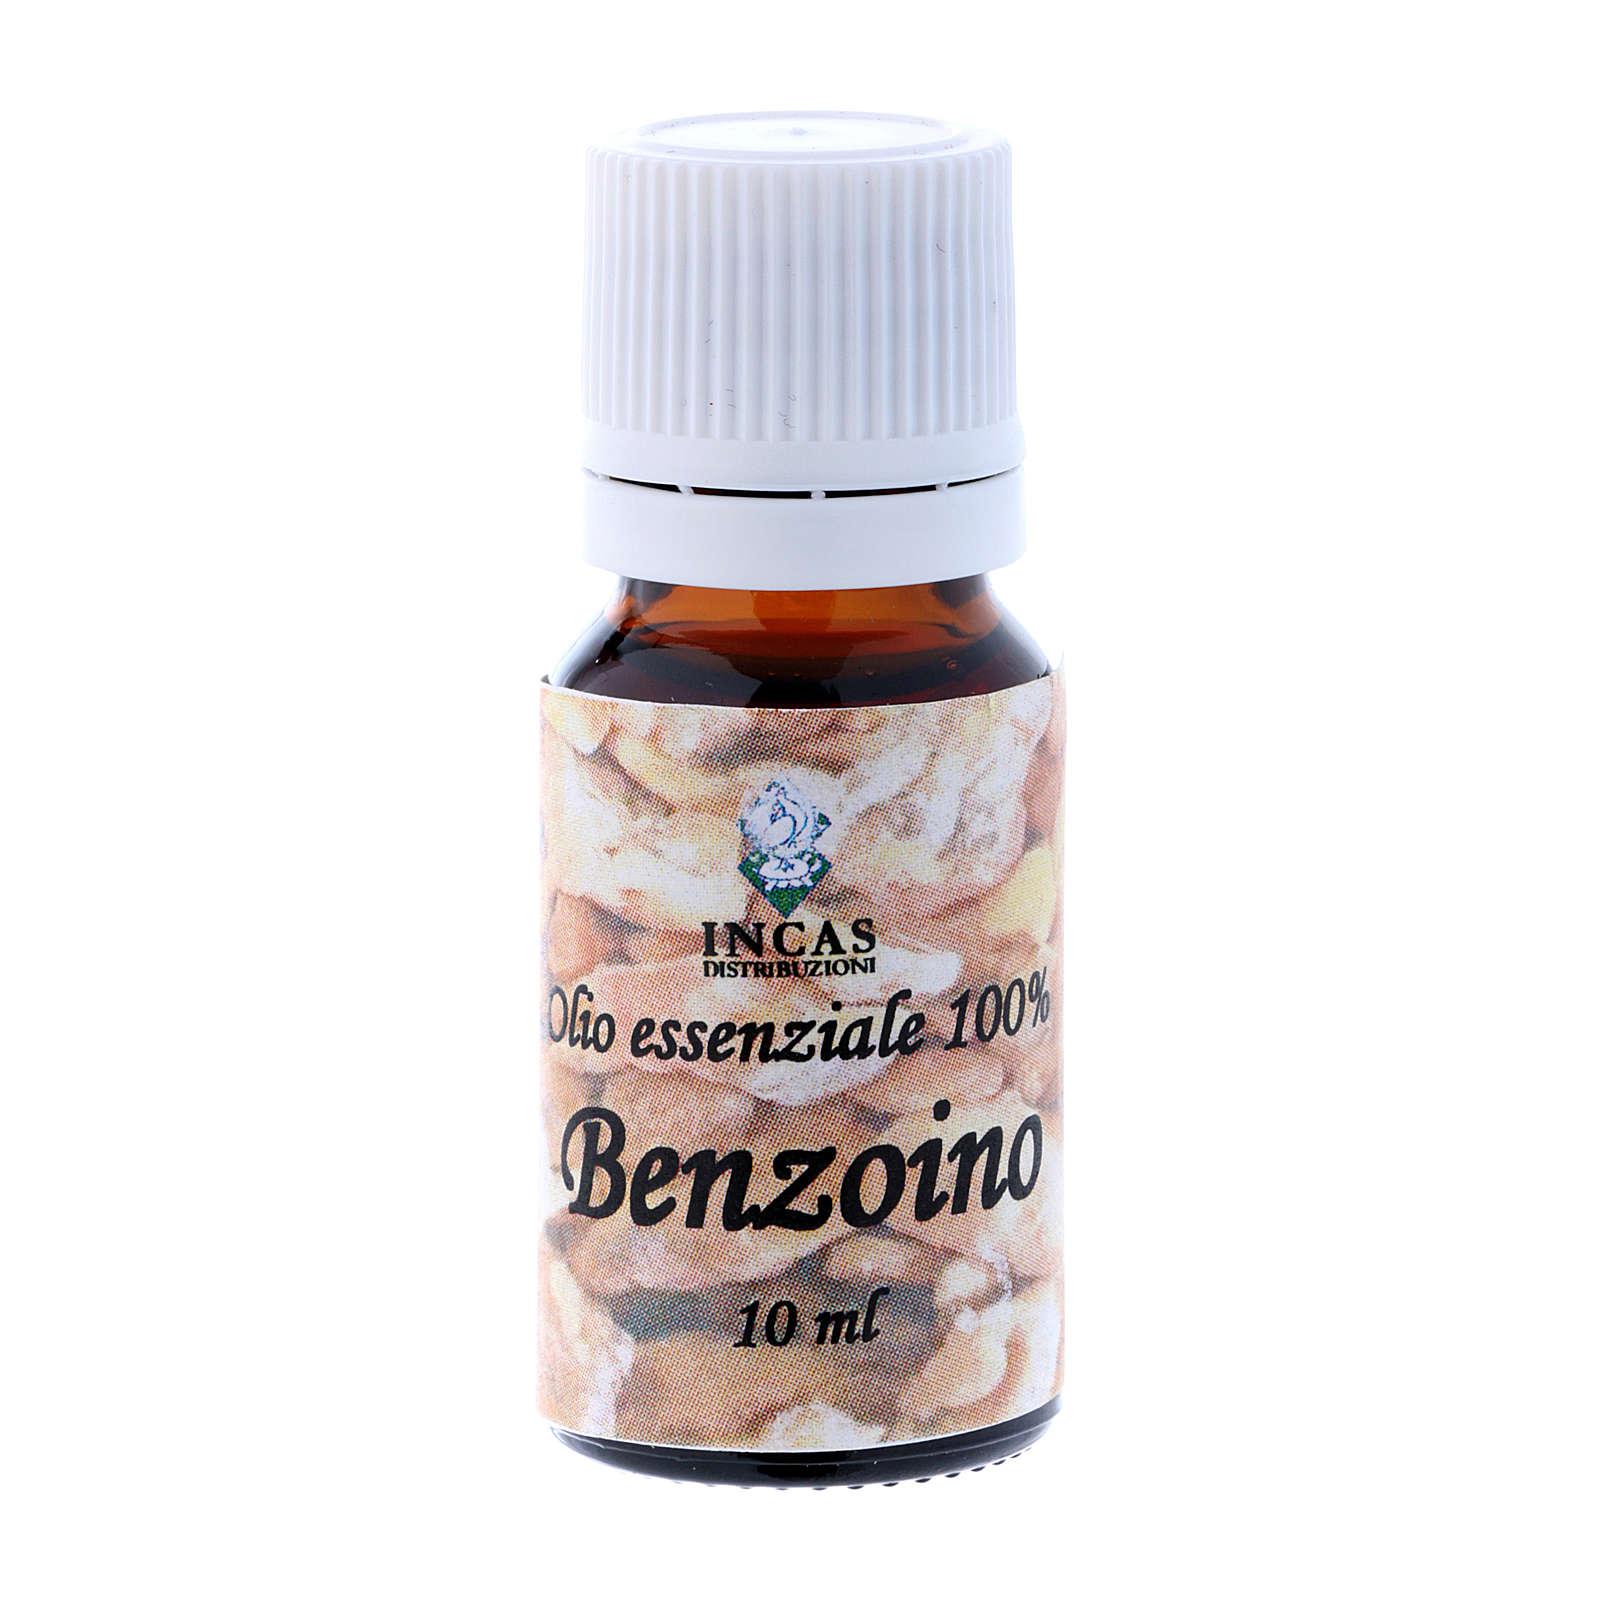 Olejek eteryczny Benzoino 10ml  3